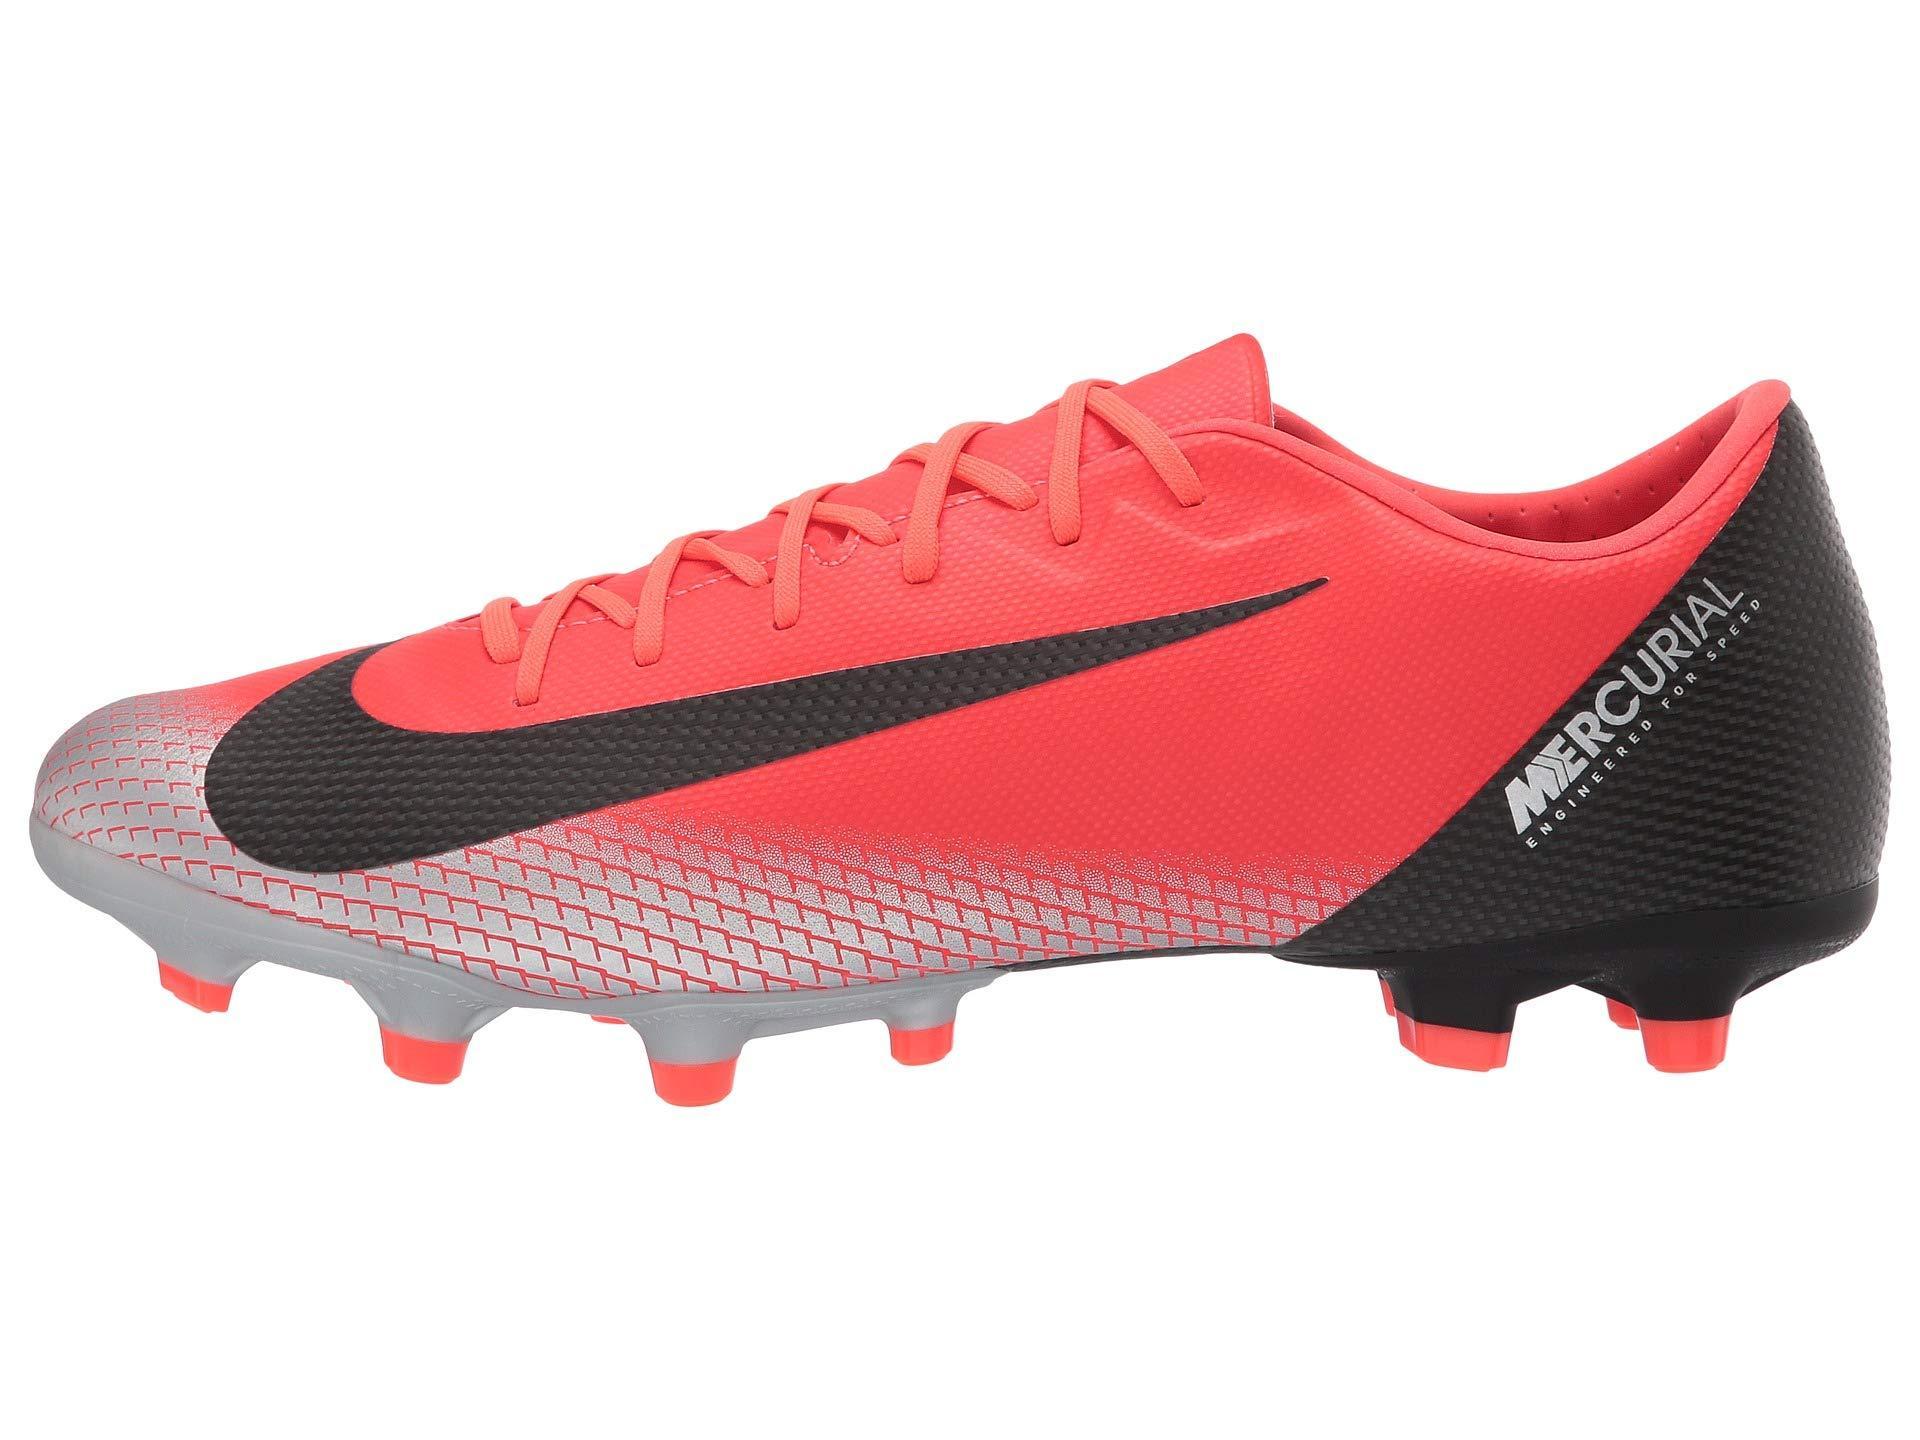 a81206405f7 Nike Vapor 12 Academy Cr7 Mg for Men - Save 6% - Lyst